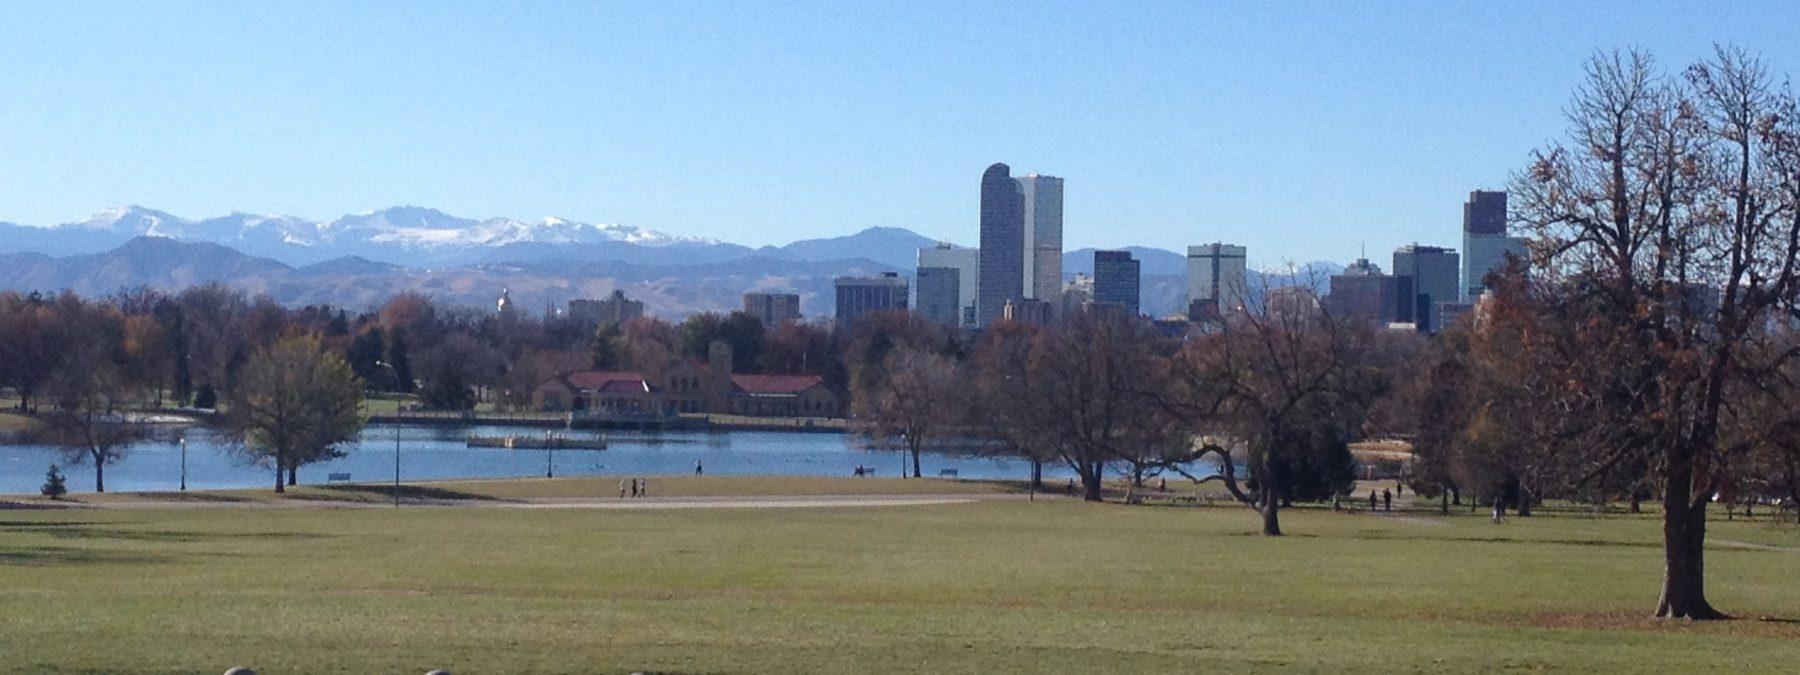 Denver (13)